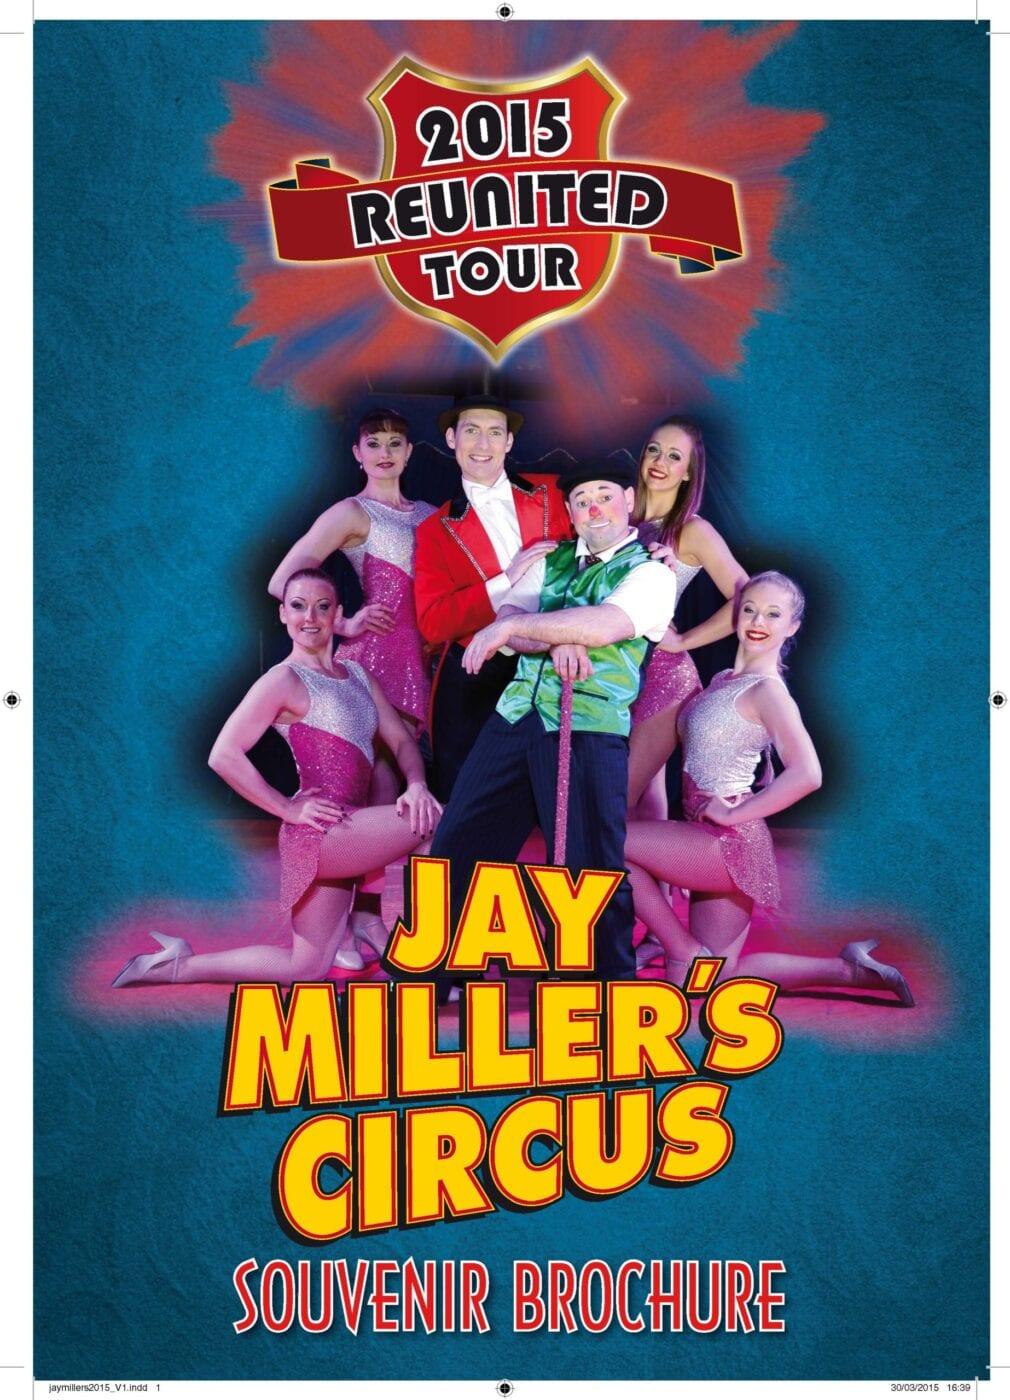 Jay Millers Circus Brochure 2015